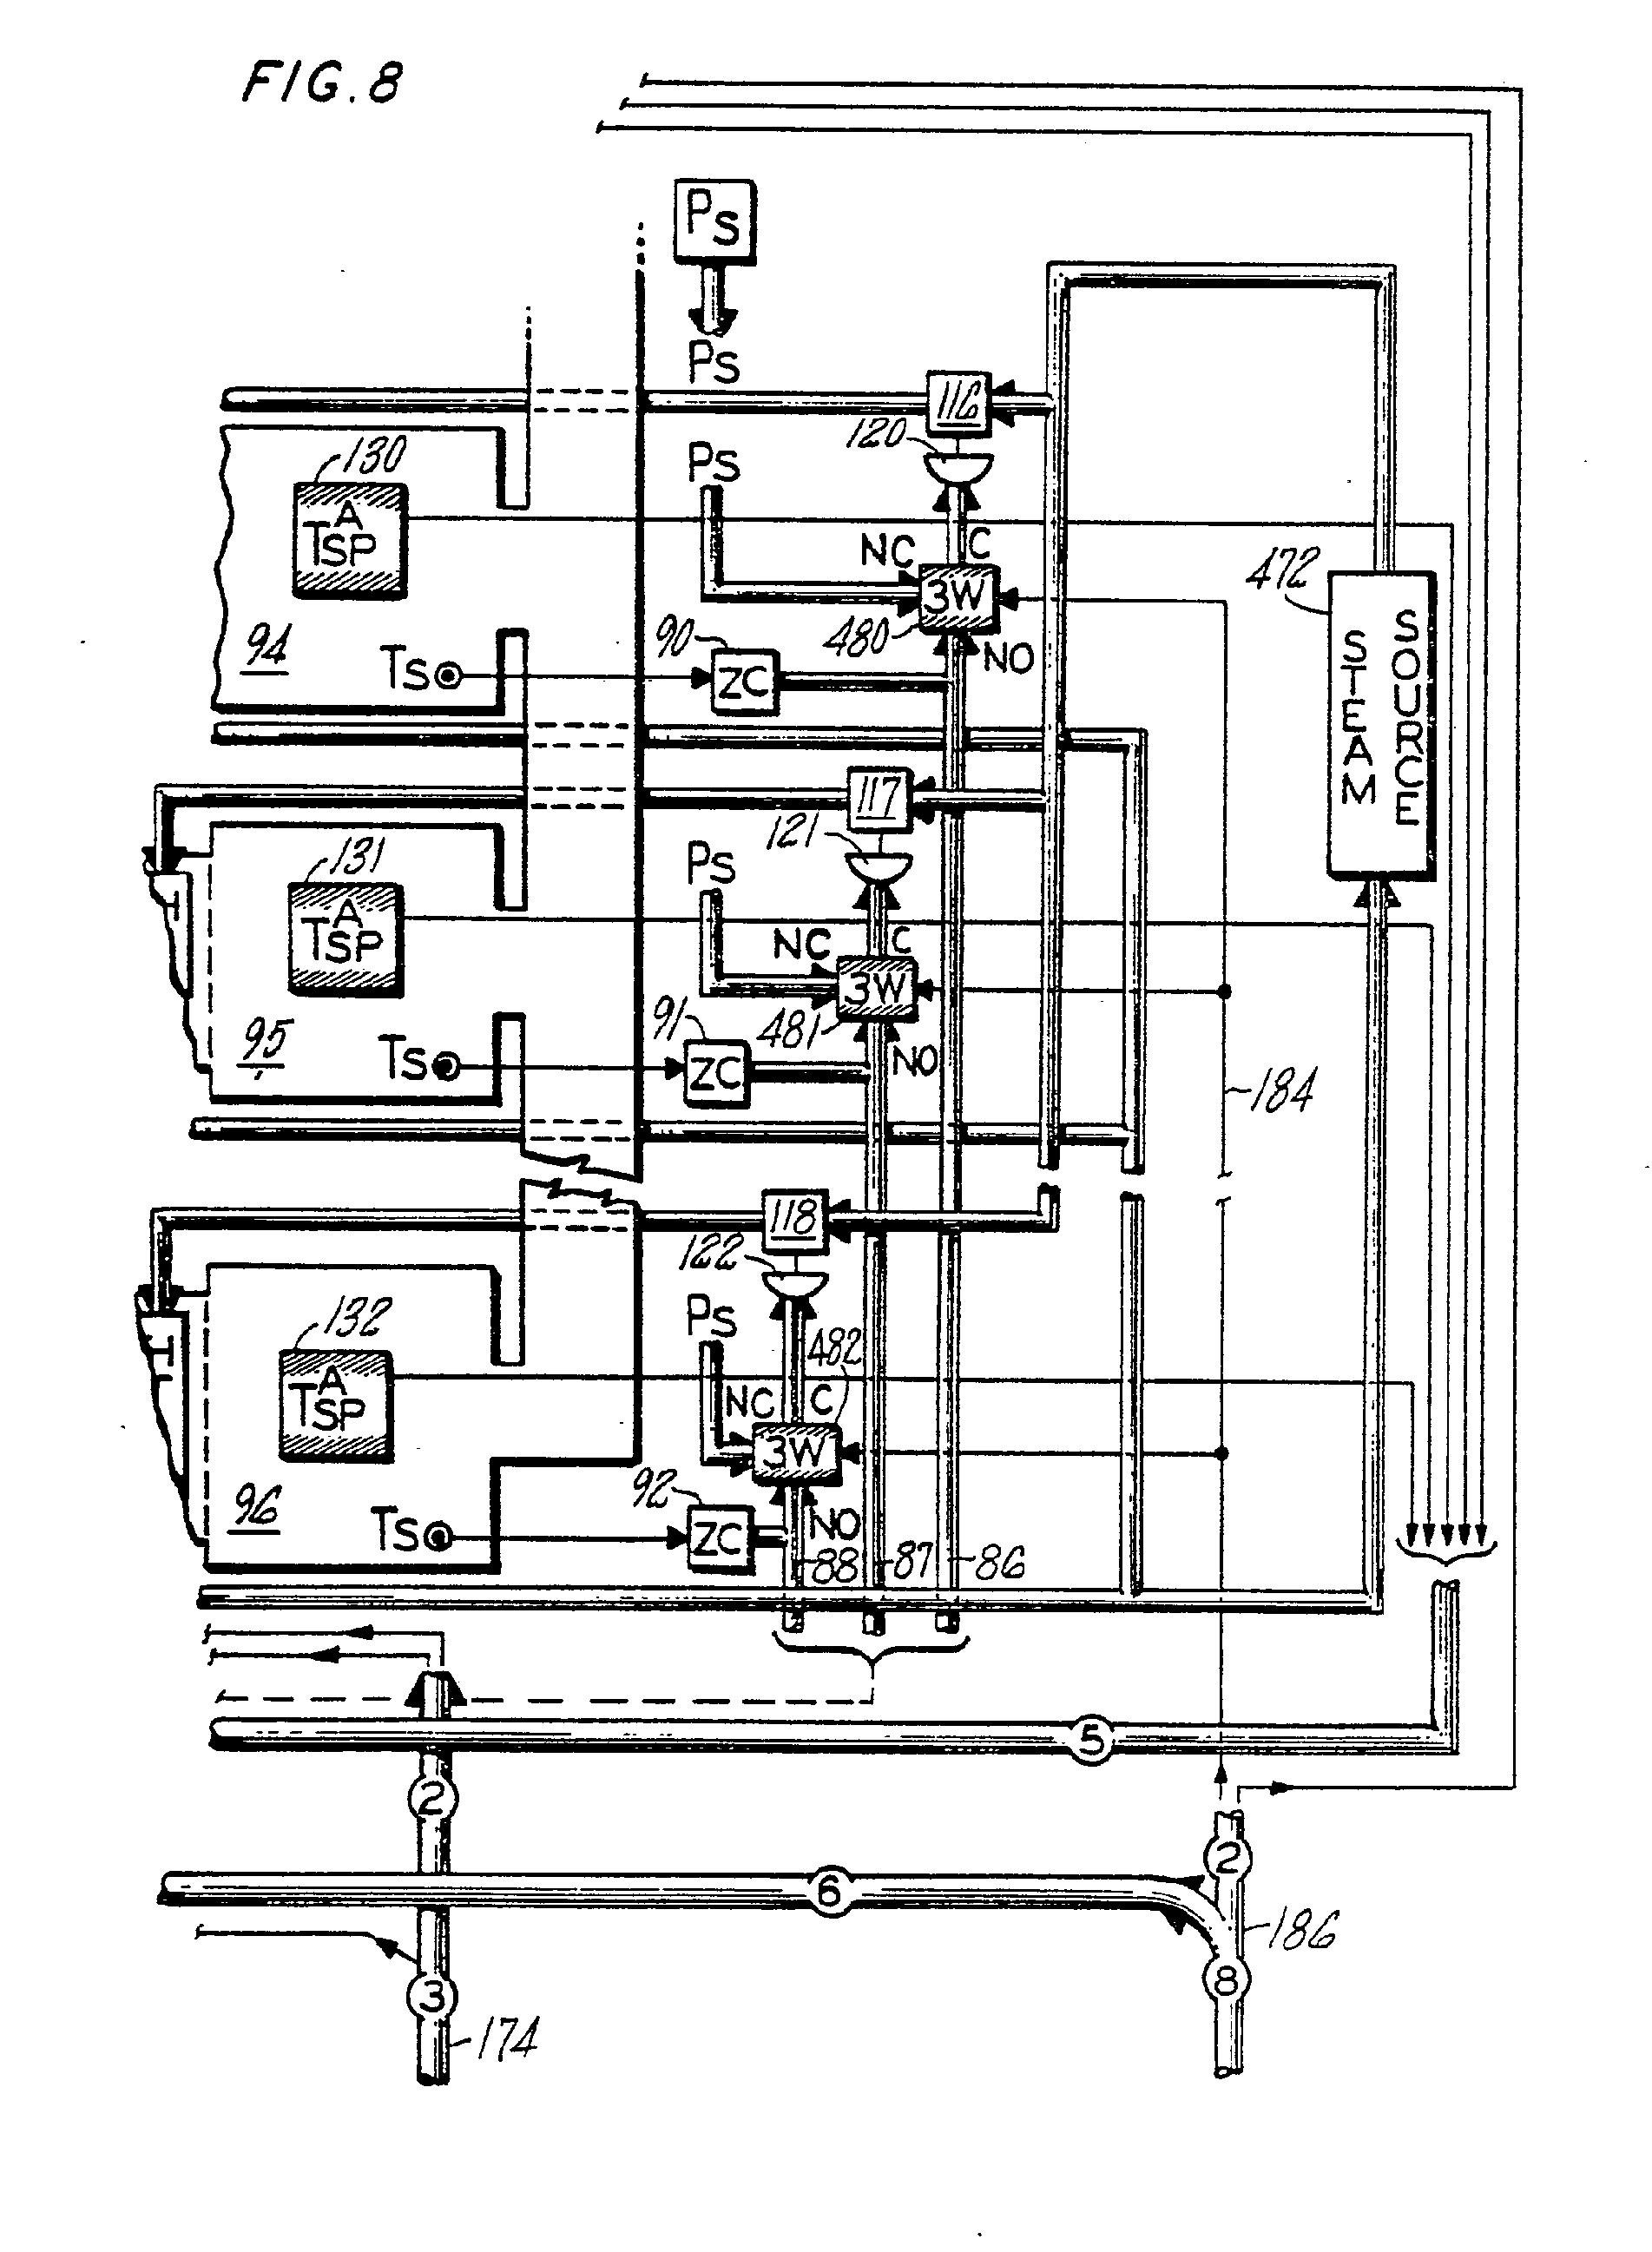 harley davidson flasher wiring diagram html